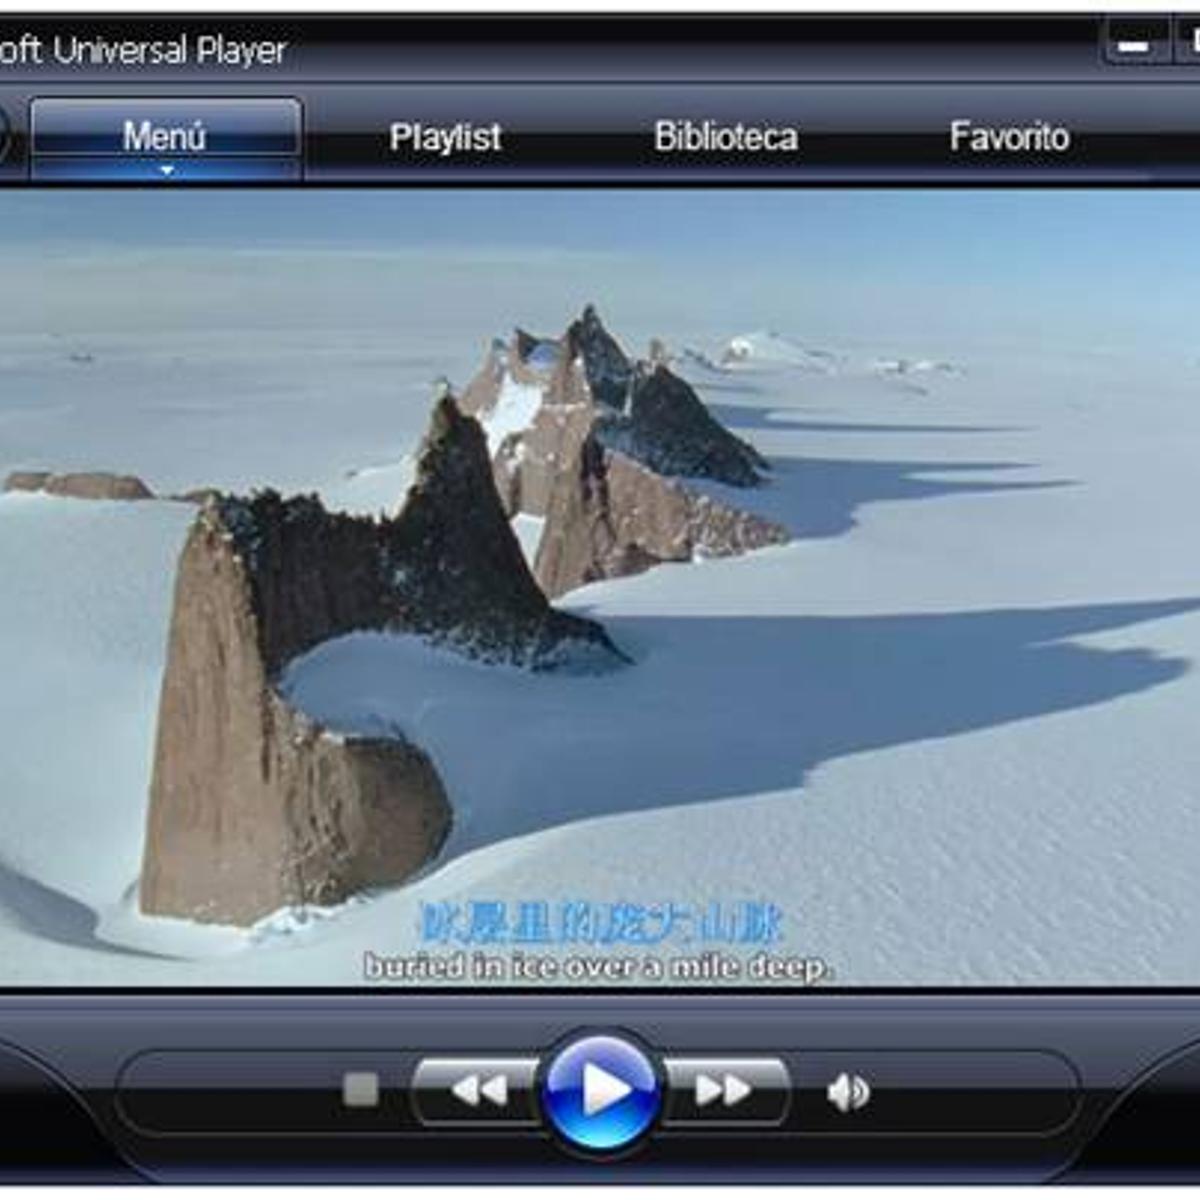 Haihaisoft Universal Player Alternatives and Similar